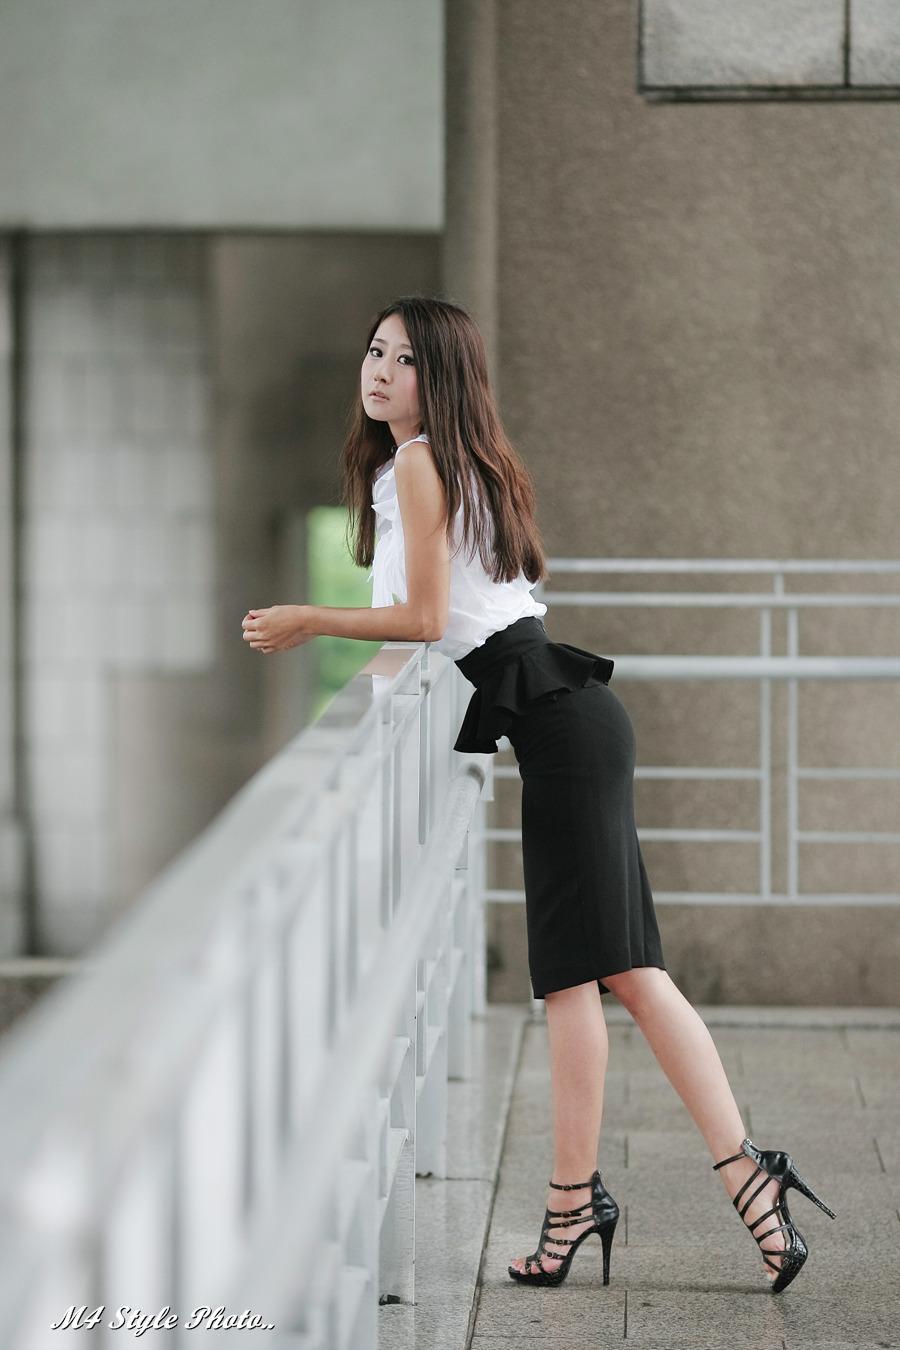 Black Pencil Skirt by ParkLeggyKorean on DeviantArt